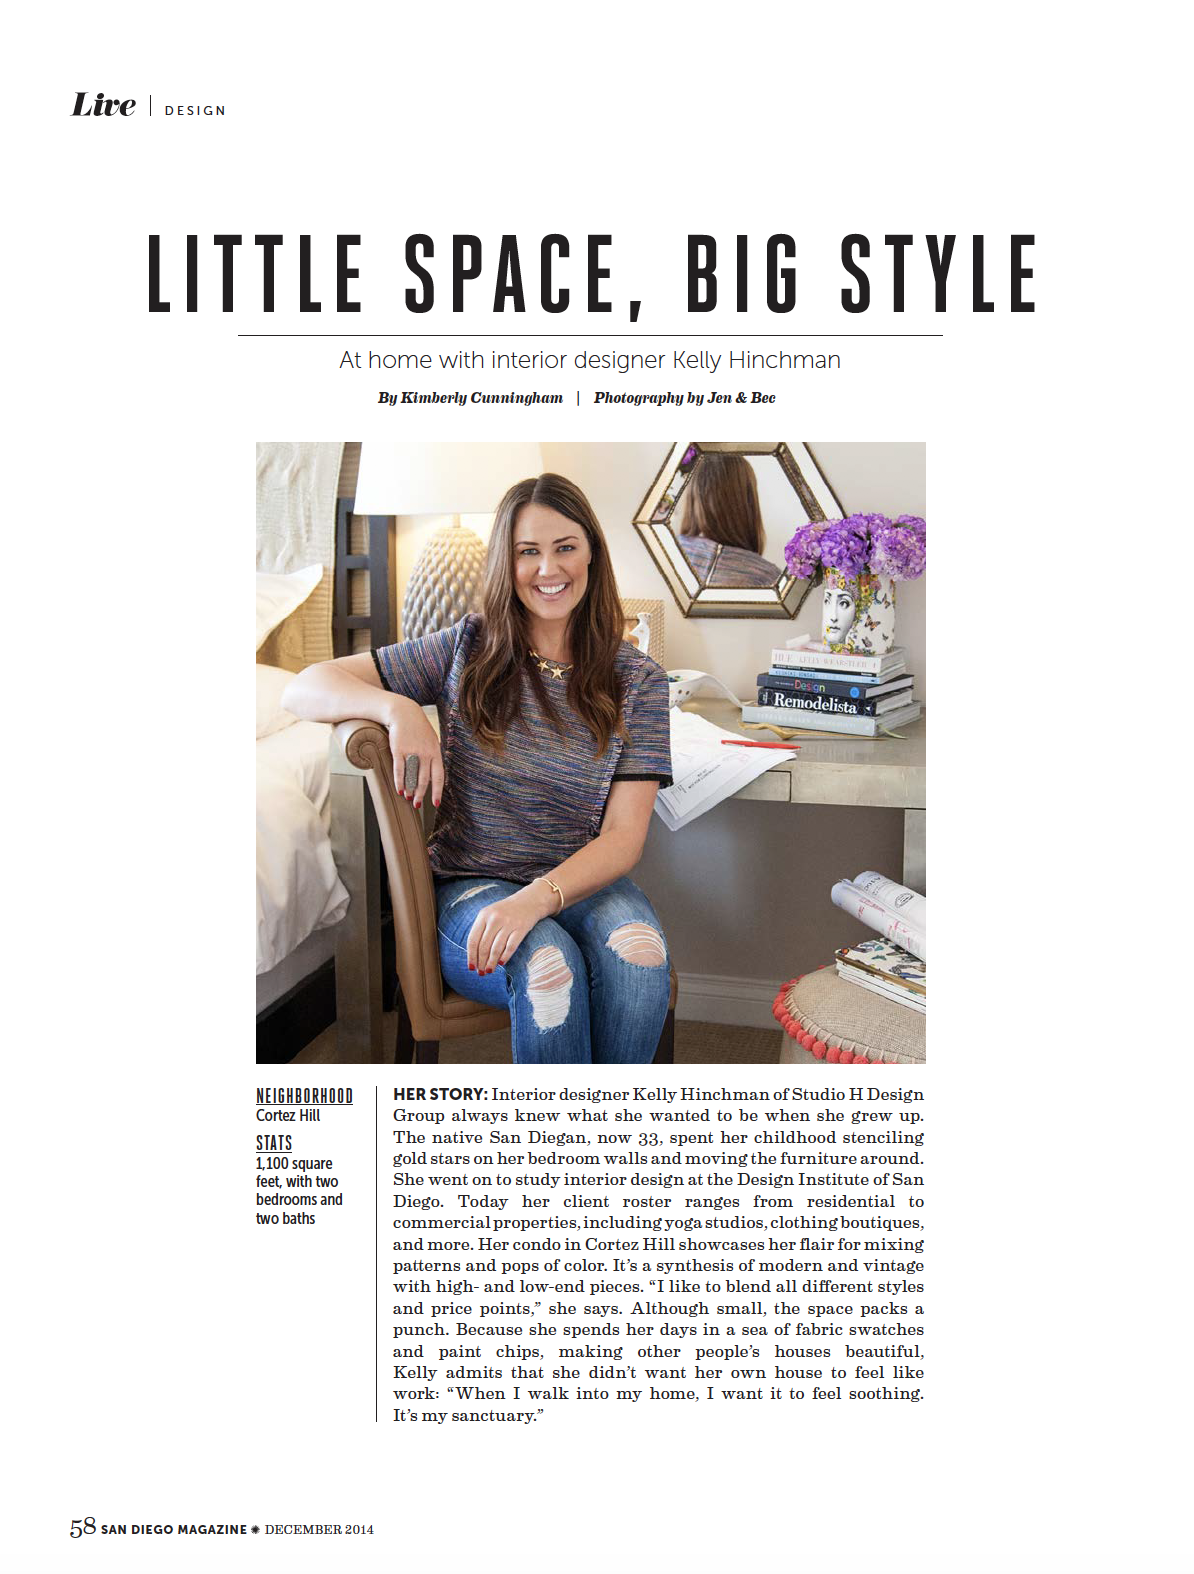 San Diego Magazine, Dec. 2014